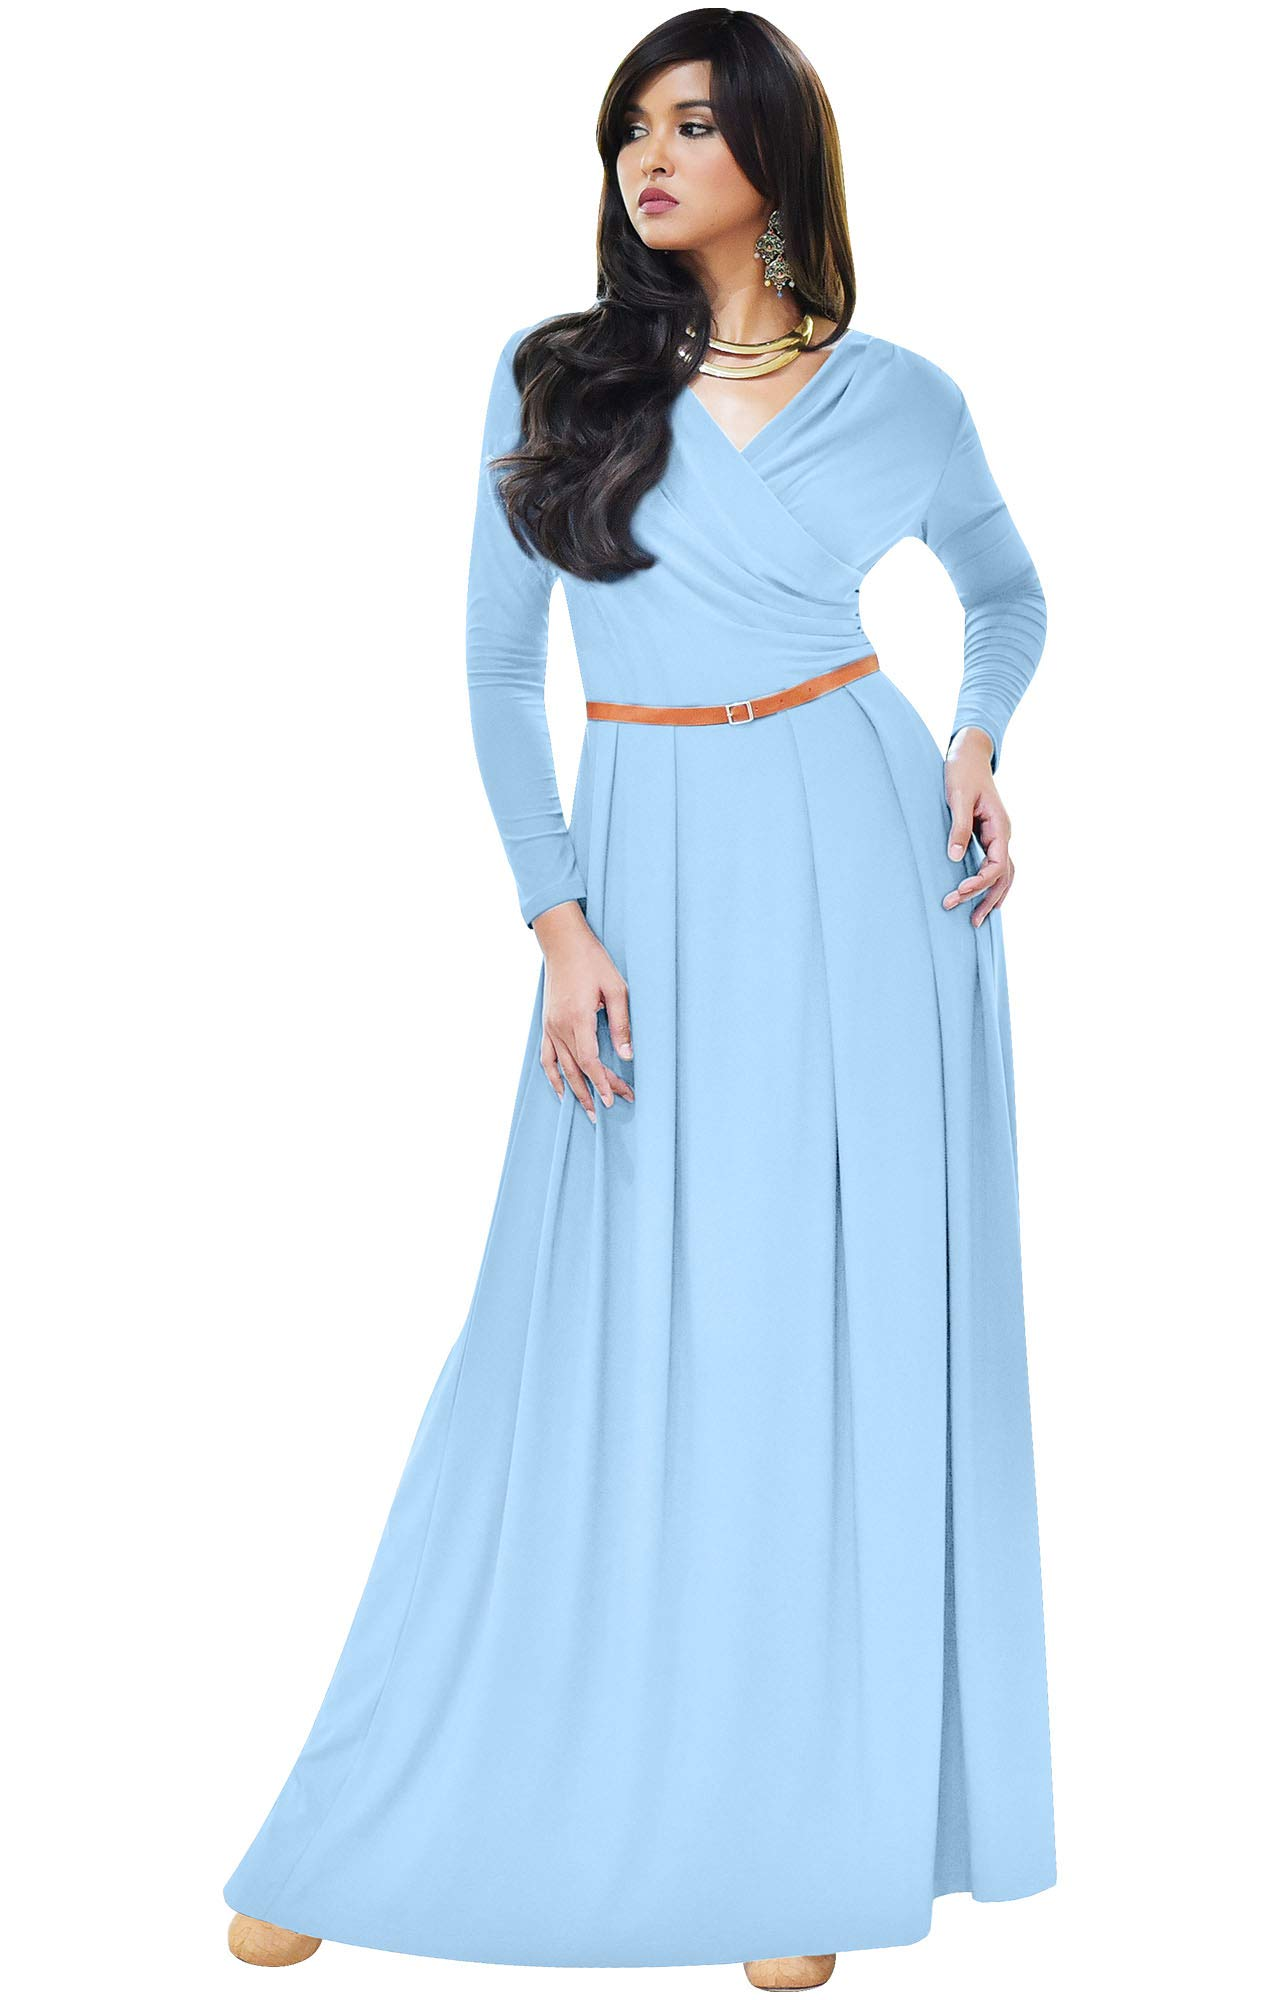 Available at Amazon: KOH KOH Women's Long V-Neck Full Sleeve Semi Formal Flowy Evening Cute Maxi Dress